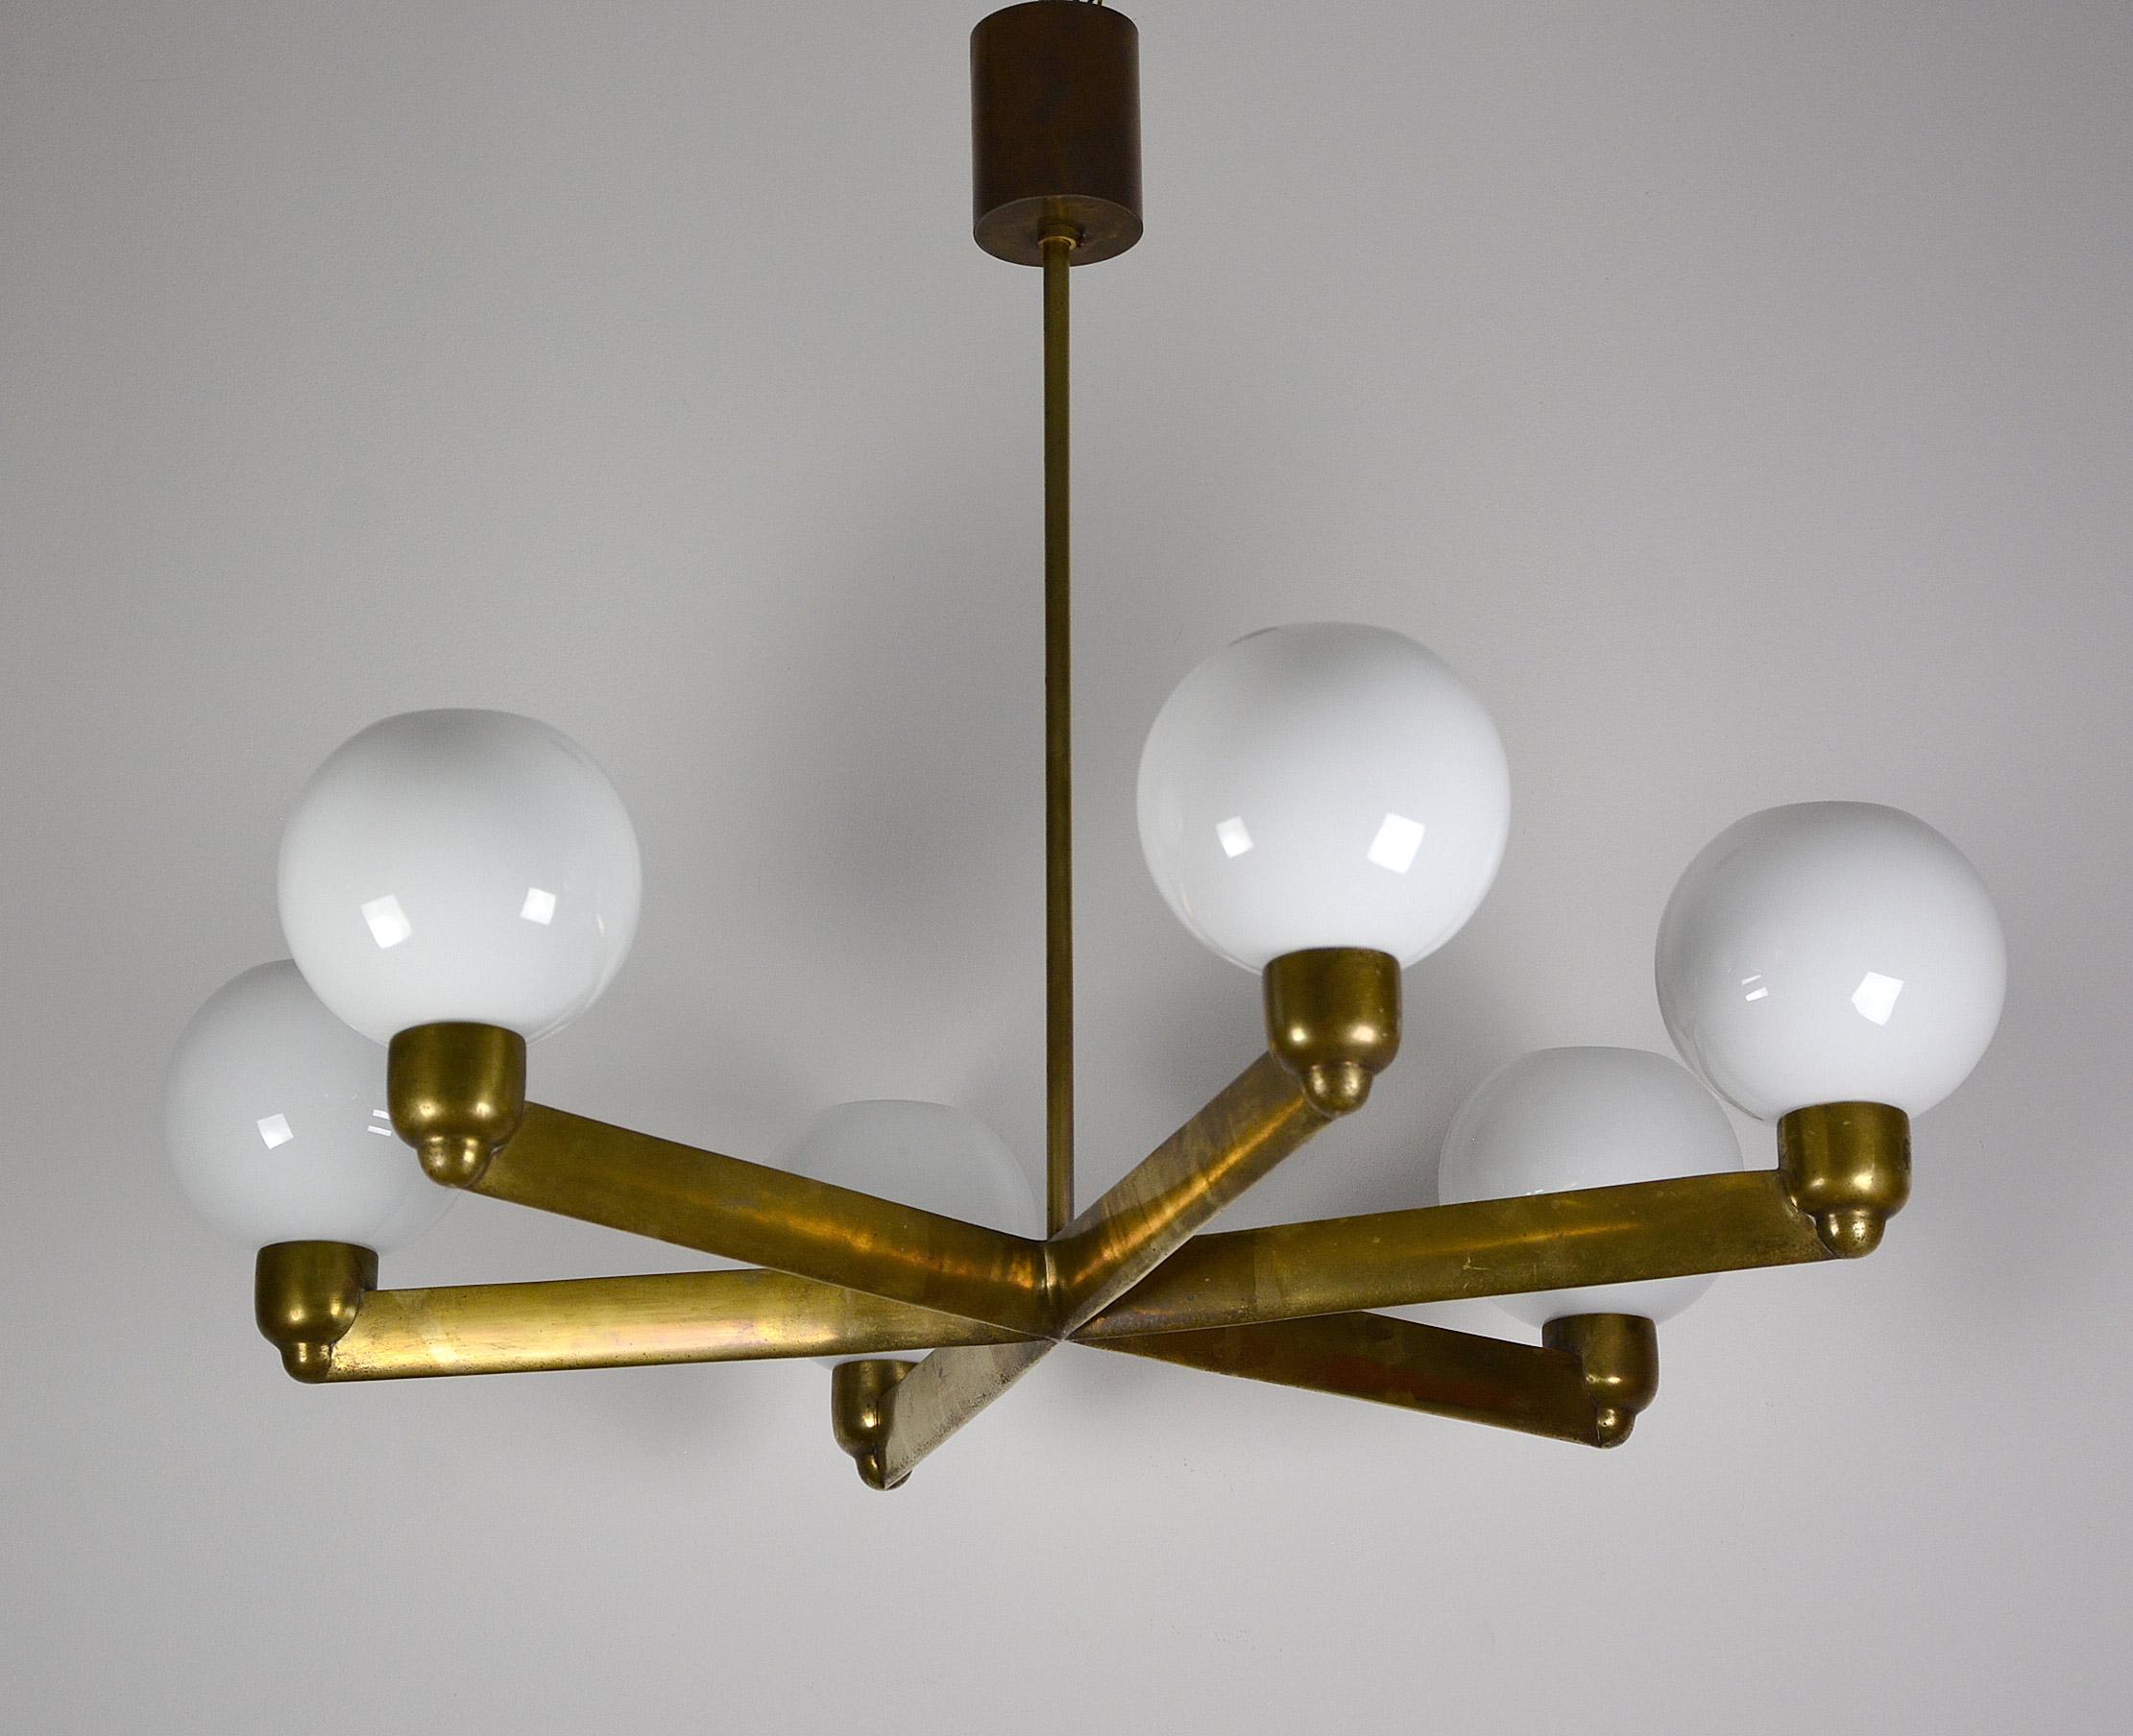 paar bauhaus art deco funktionalismus deckenlampen chrom. Black Bedroom Furniture Sets. Home Design Ideas